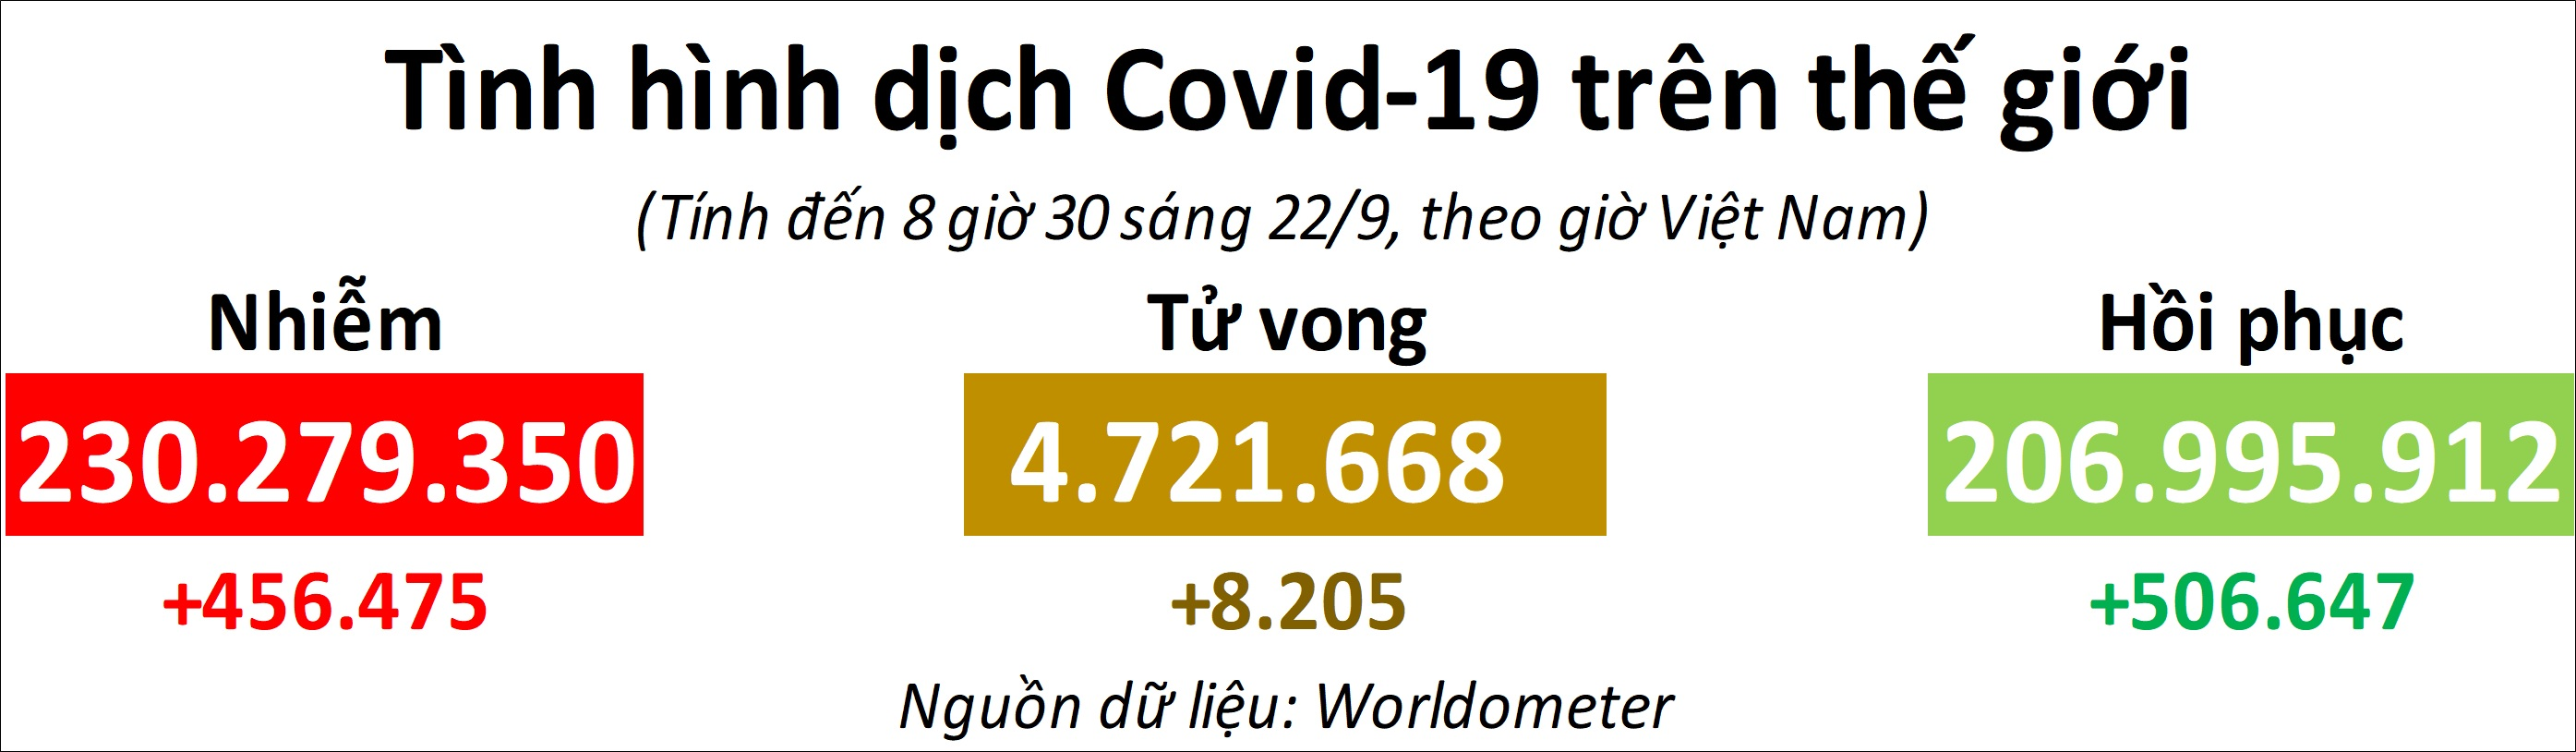 Thế giới vượt mốc 230 triệu ca mắc Covid-19 -0